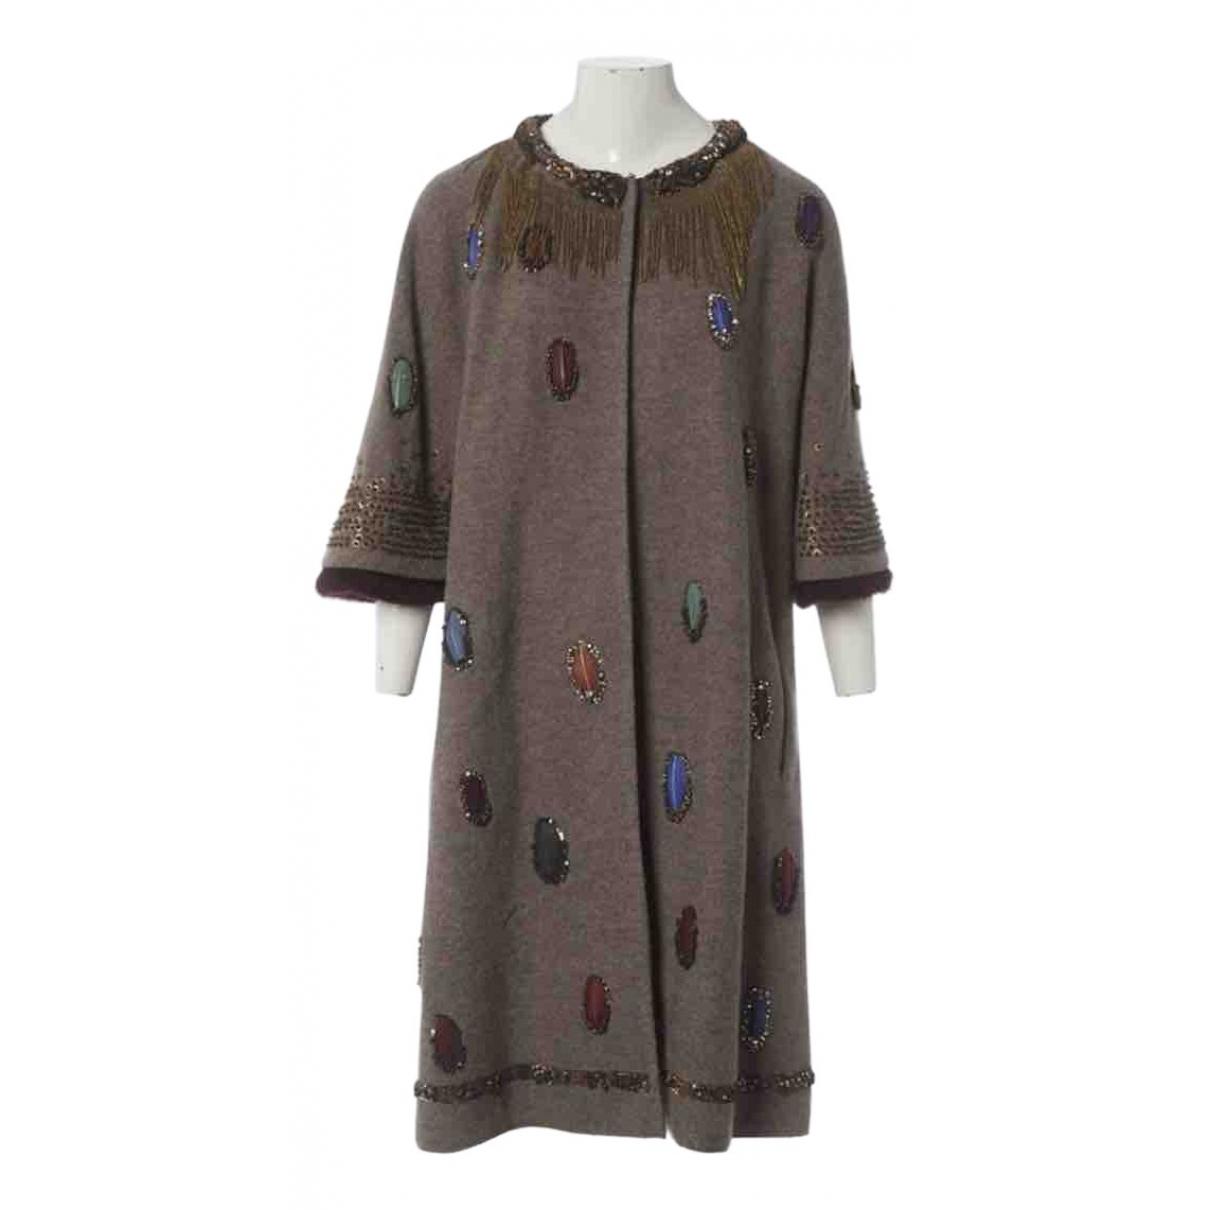 Maurizio Pecoraro \N Wool coat for Women 46 IT